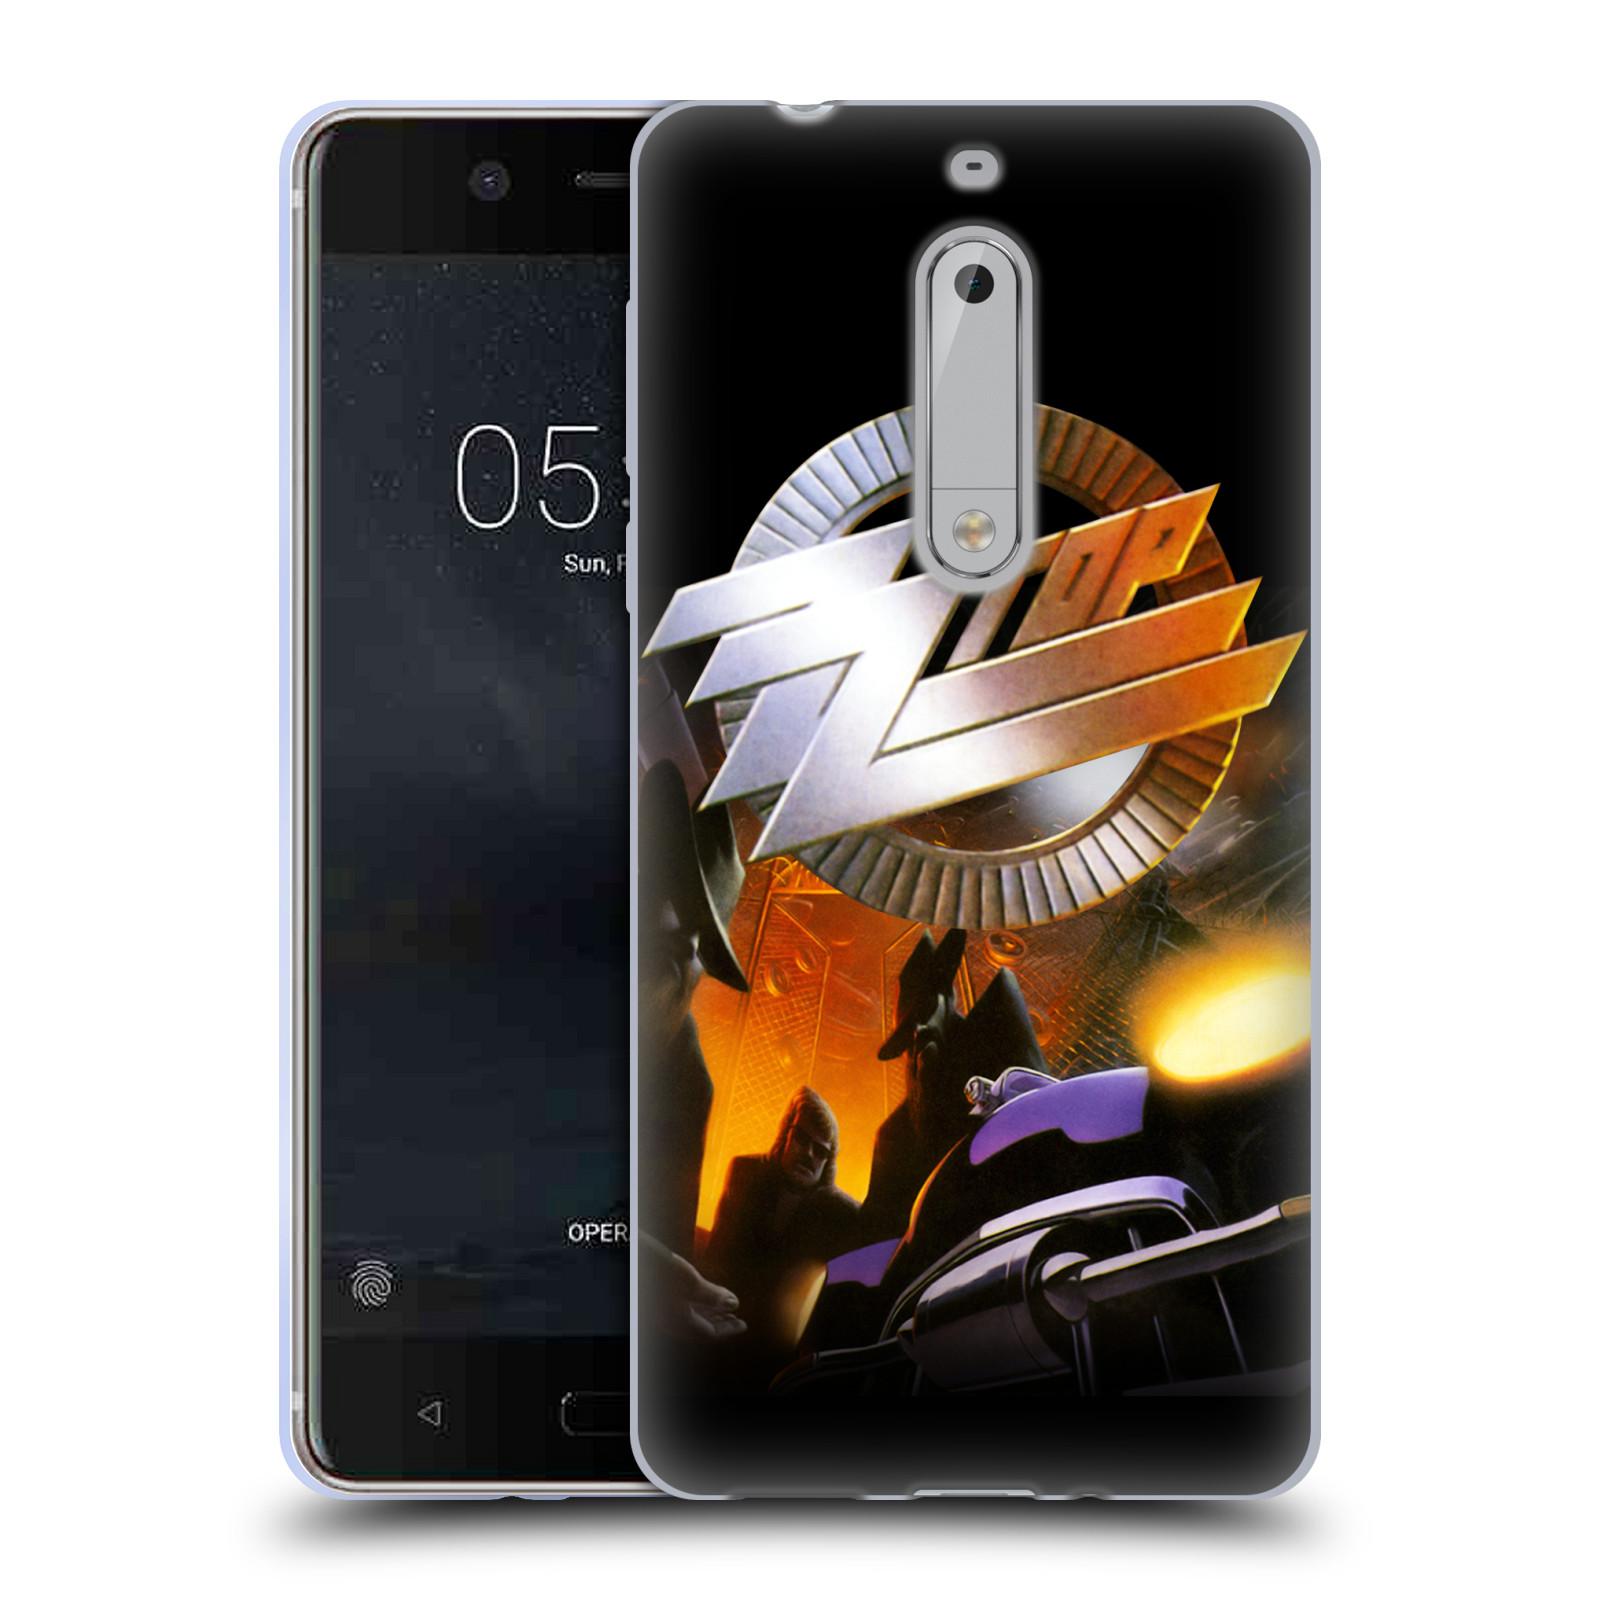 HEAD CASE silikonový obal na mobil Nokia 5 ZZ Top album Recycler